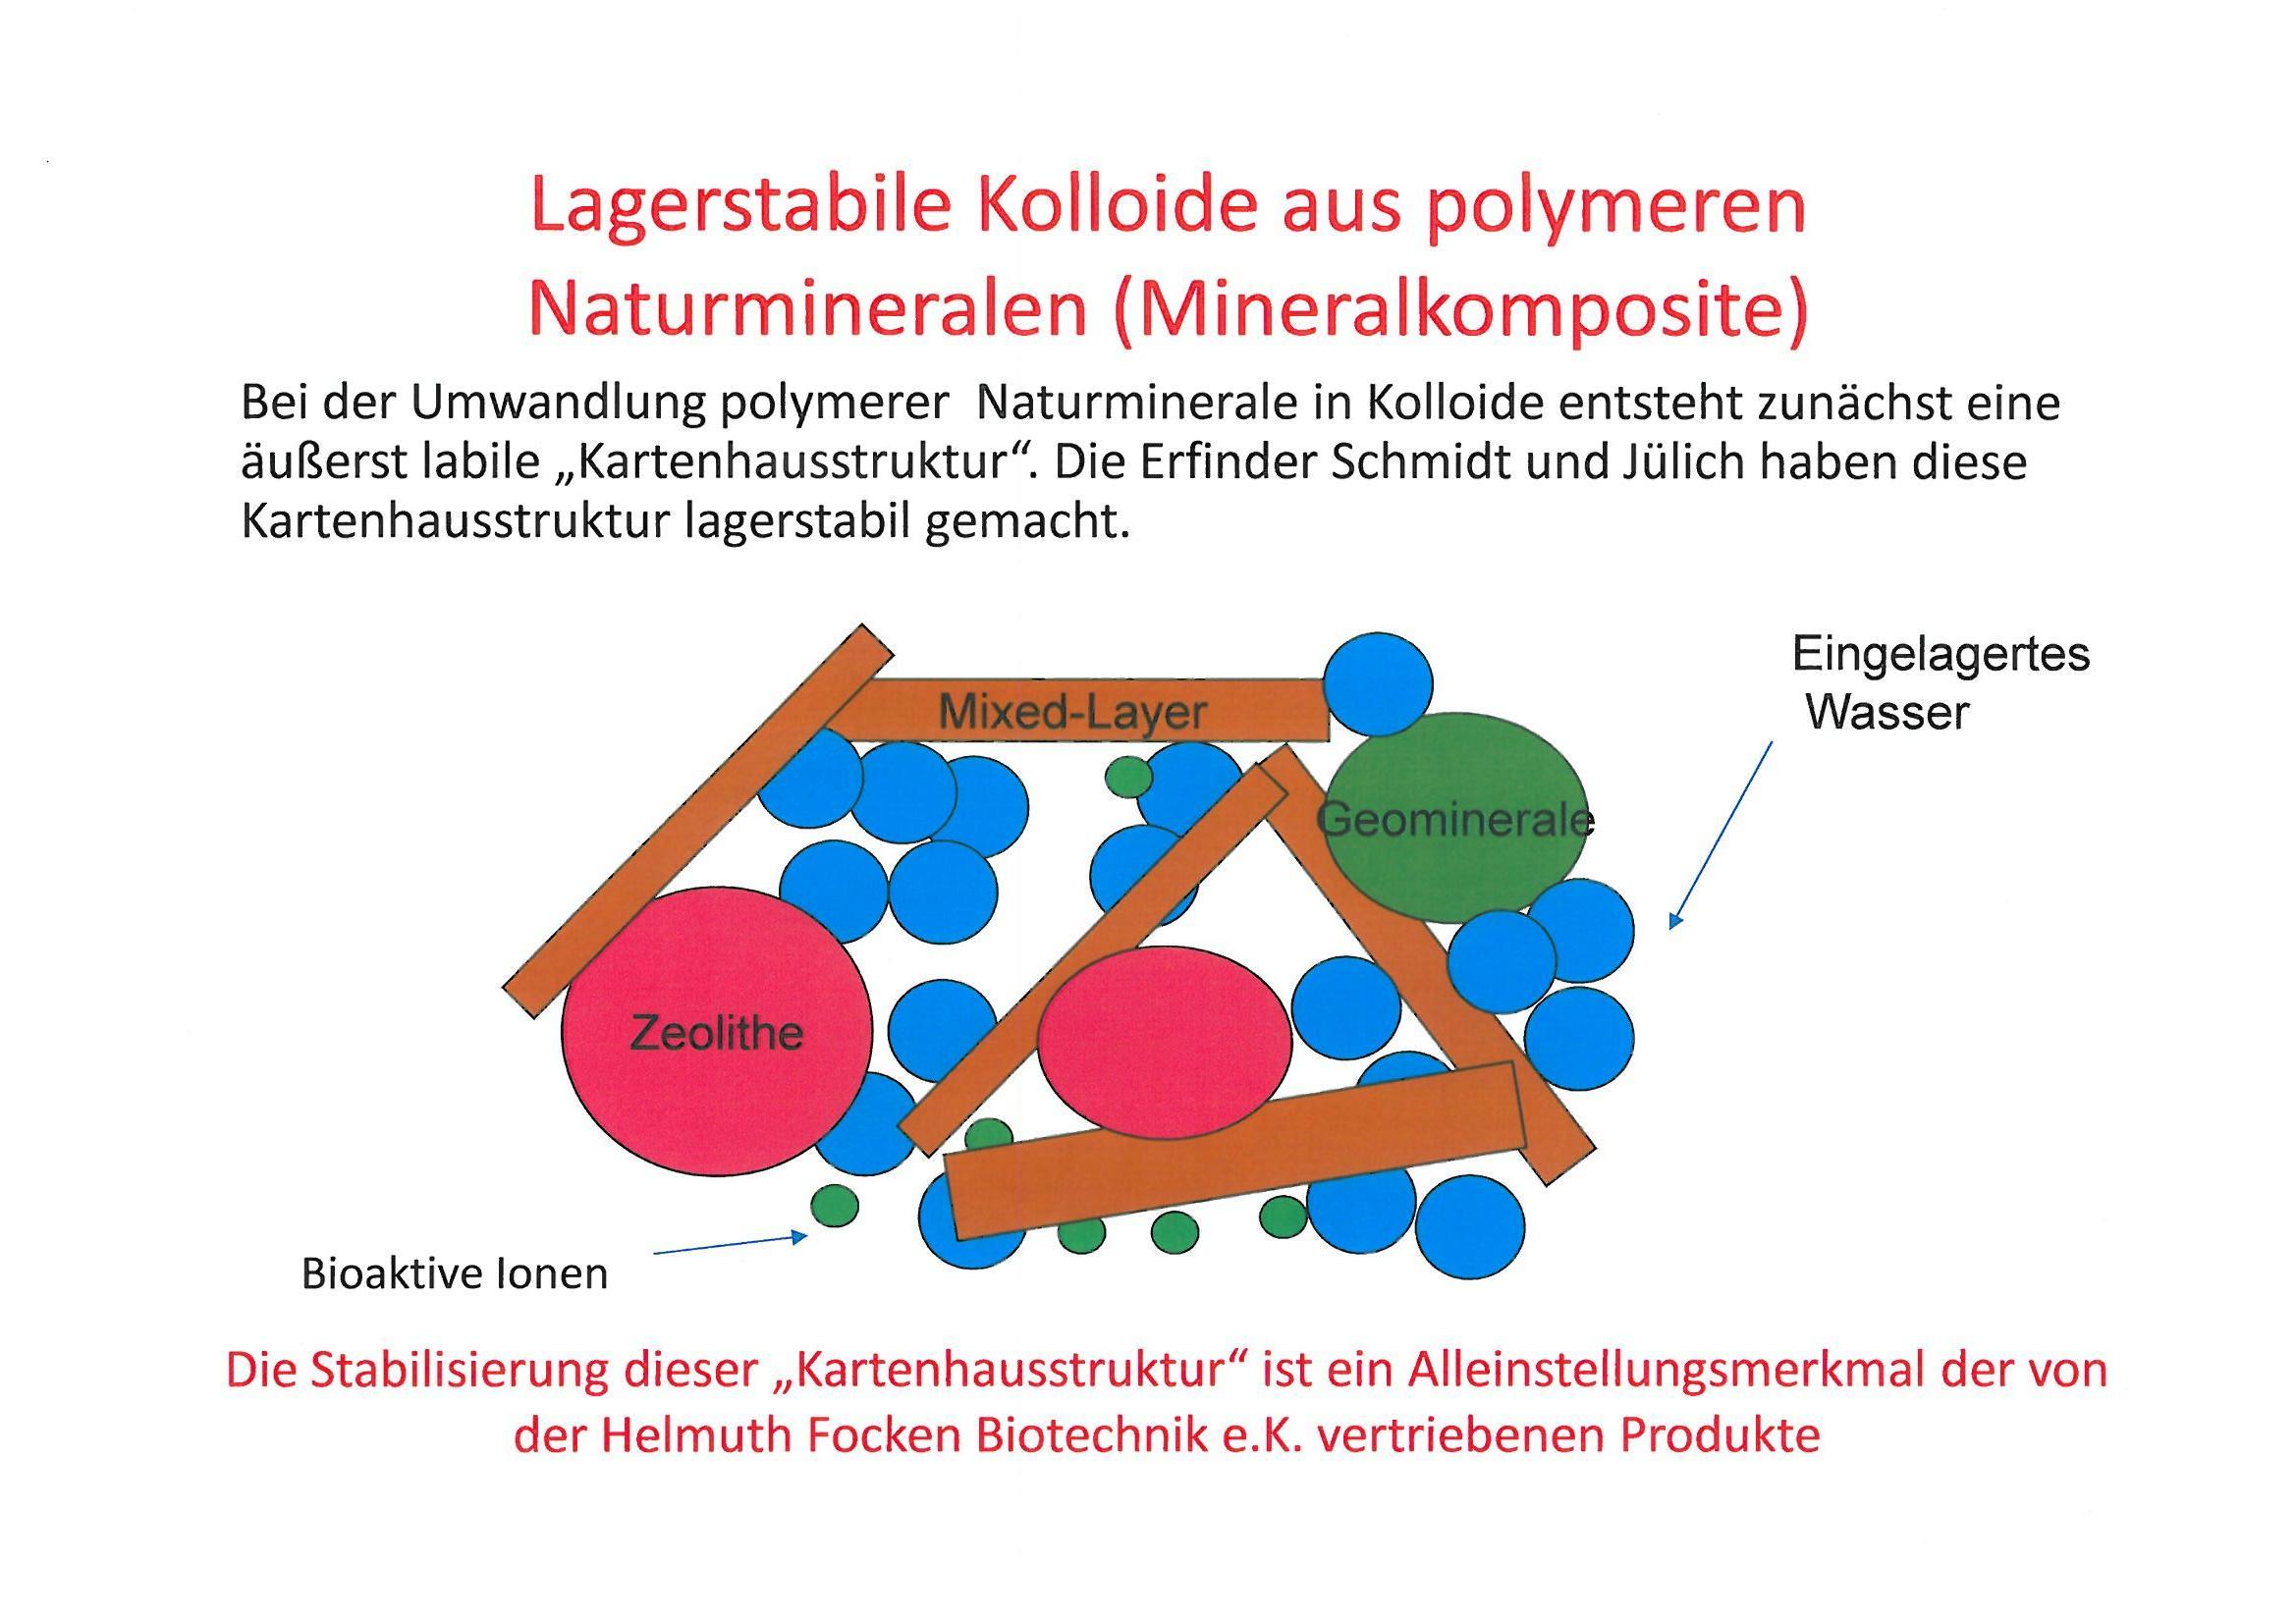 lagerstabil kolloid polymer Naturmineral